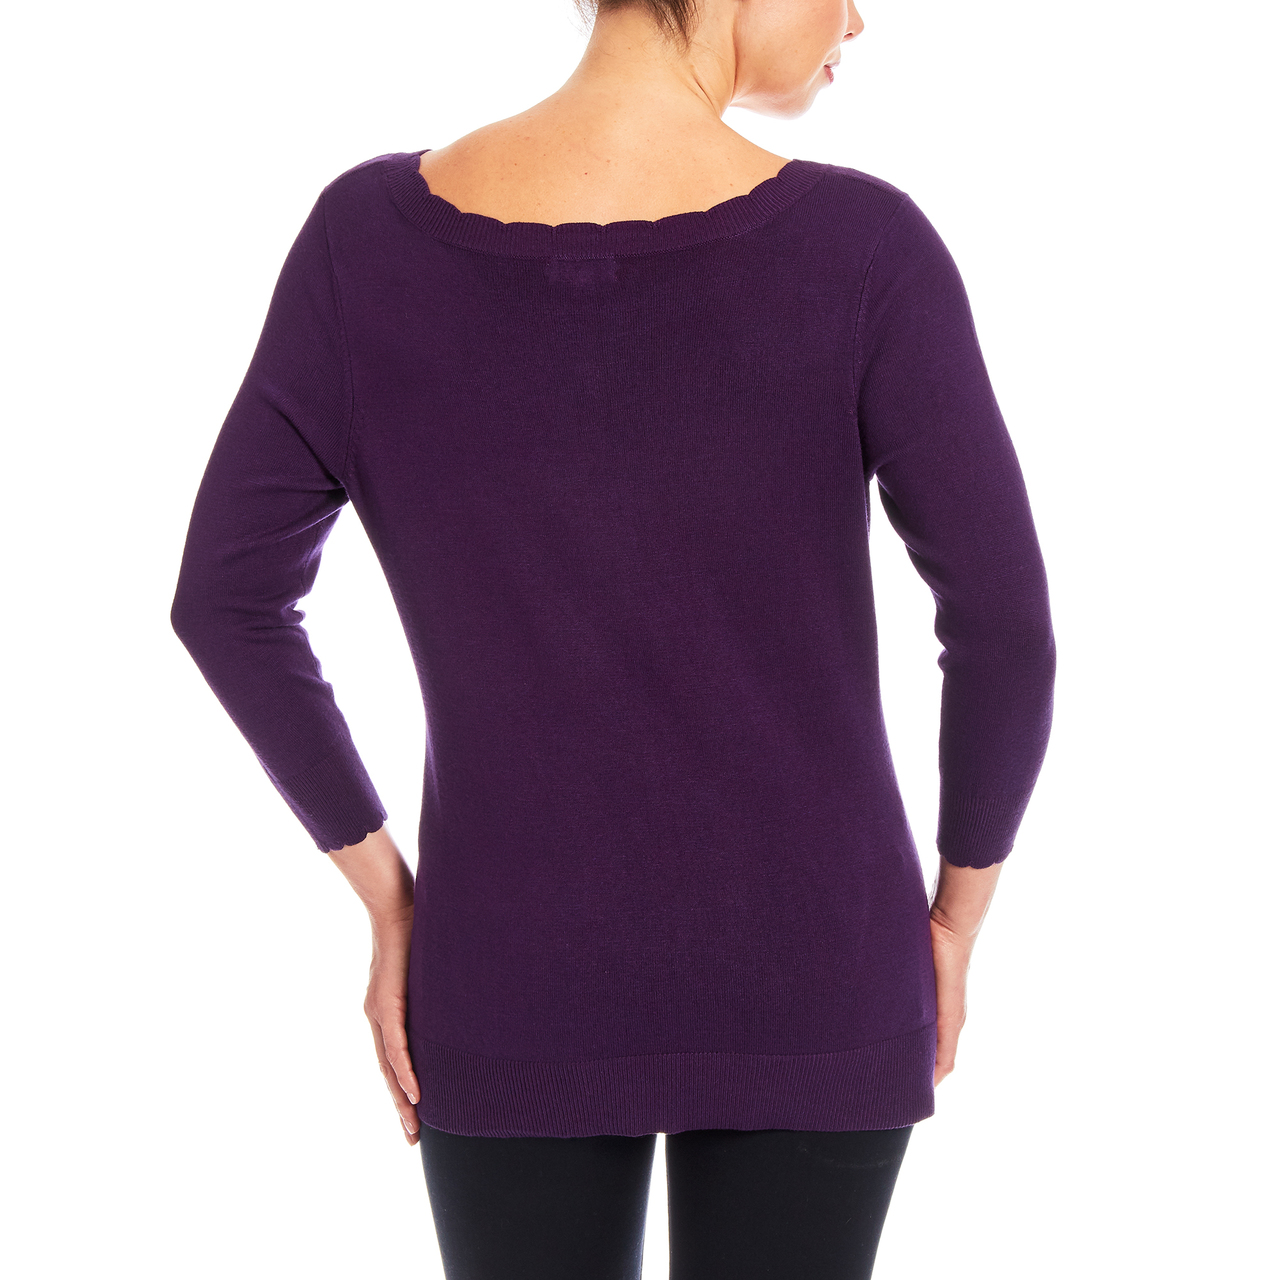 3/4 Sleeve Scallop Neck Sweater In Blackberry